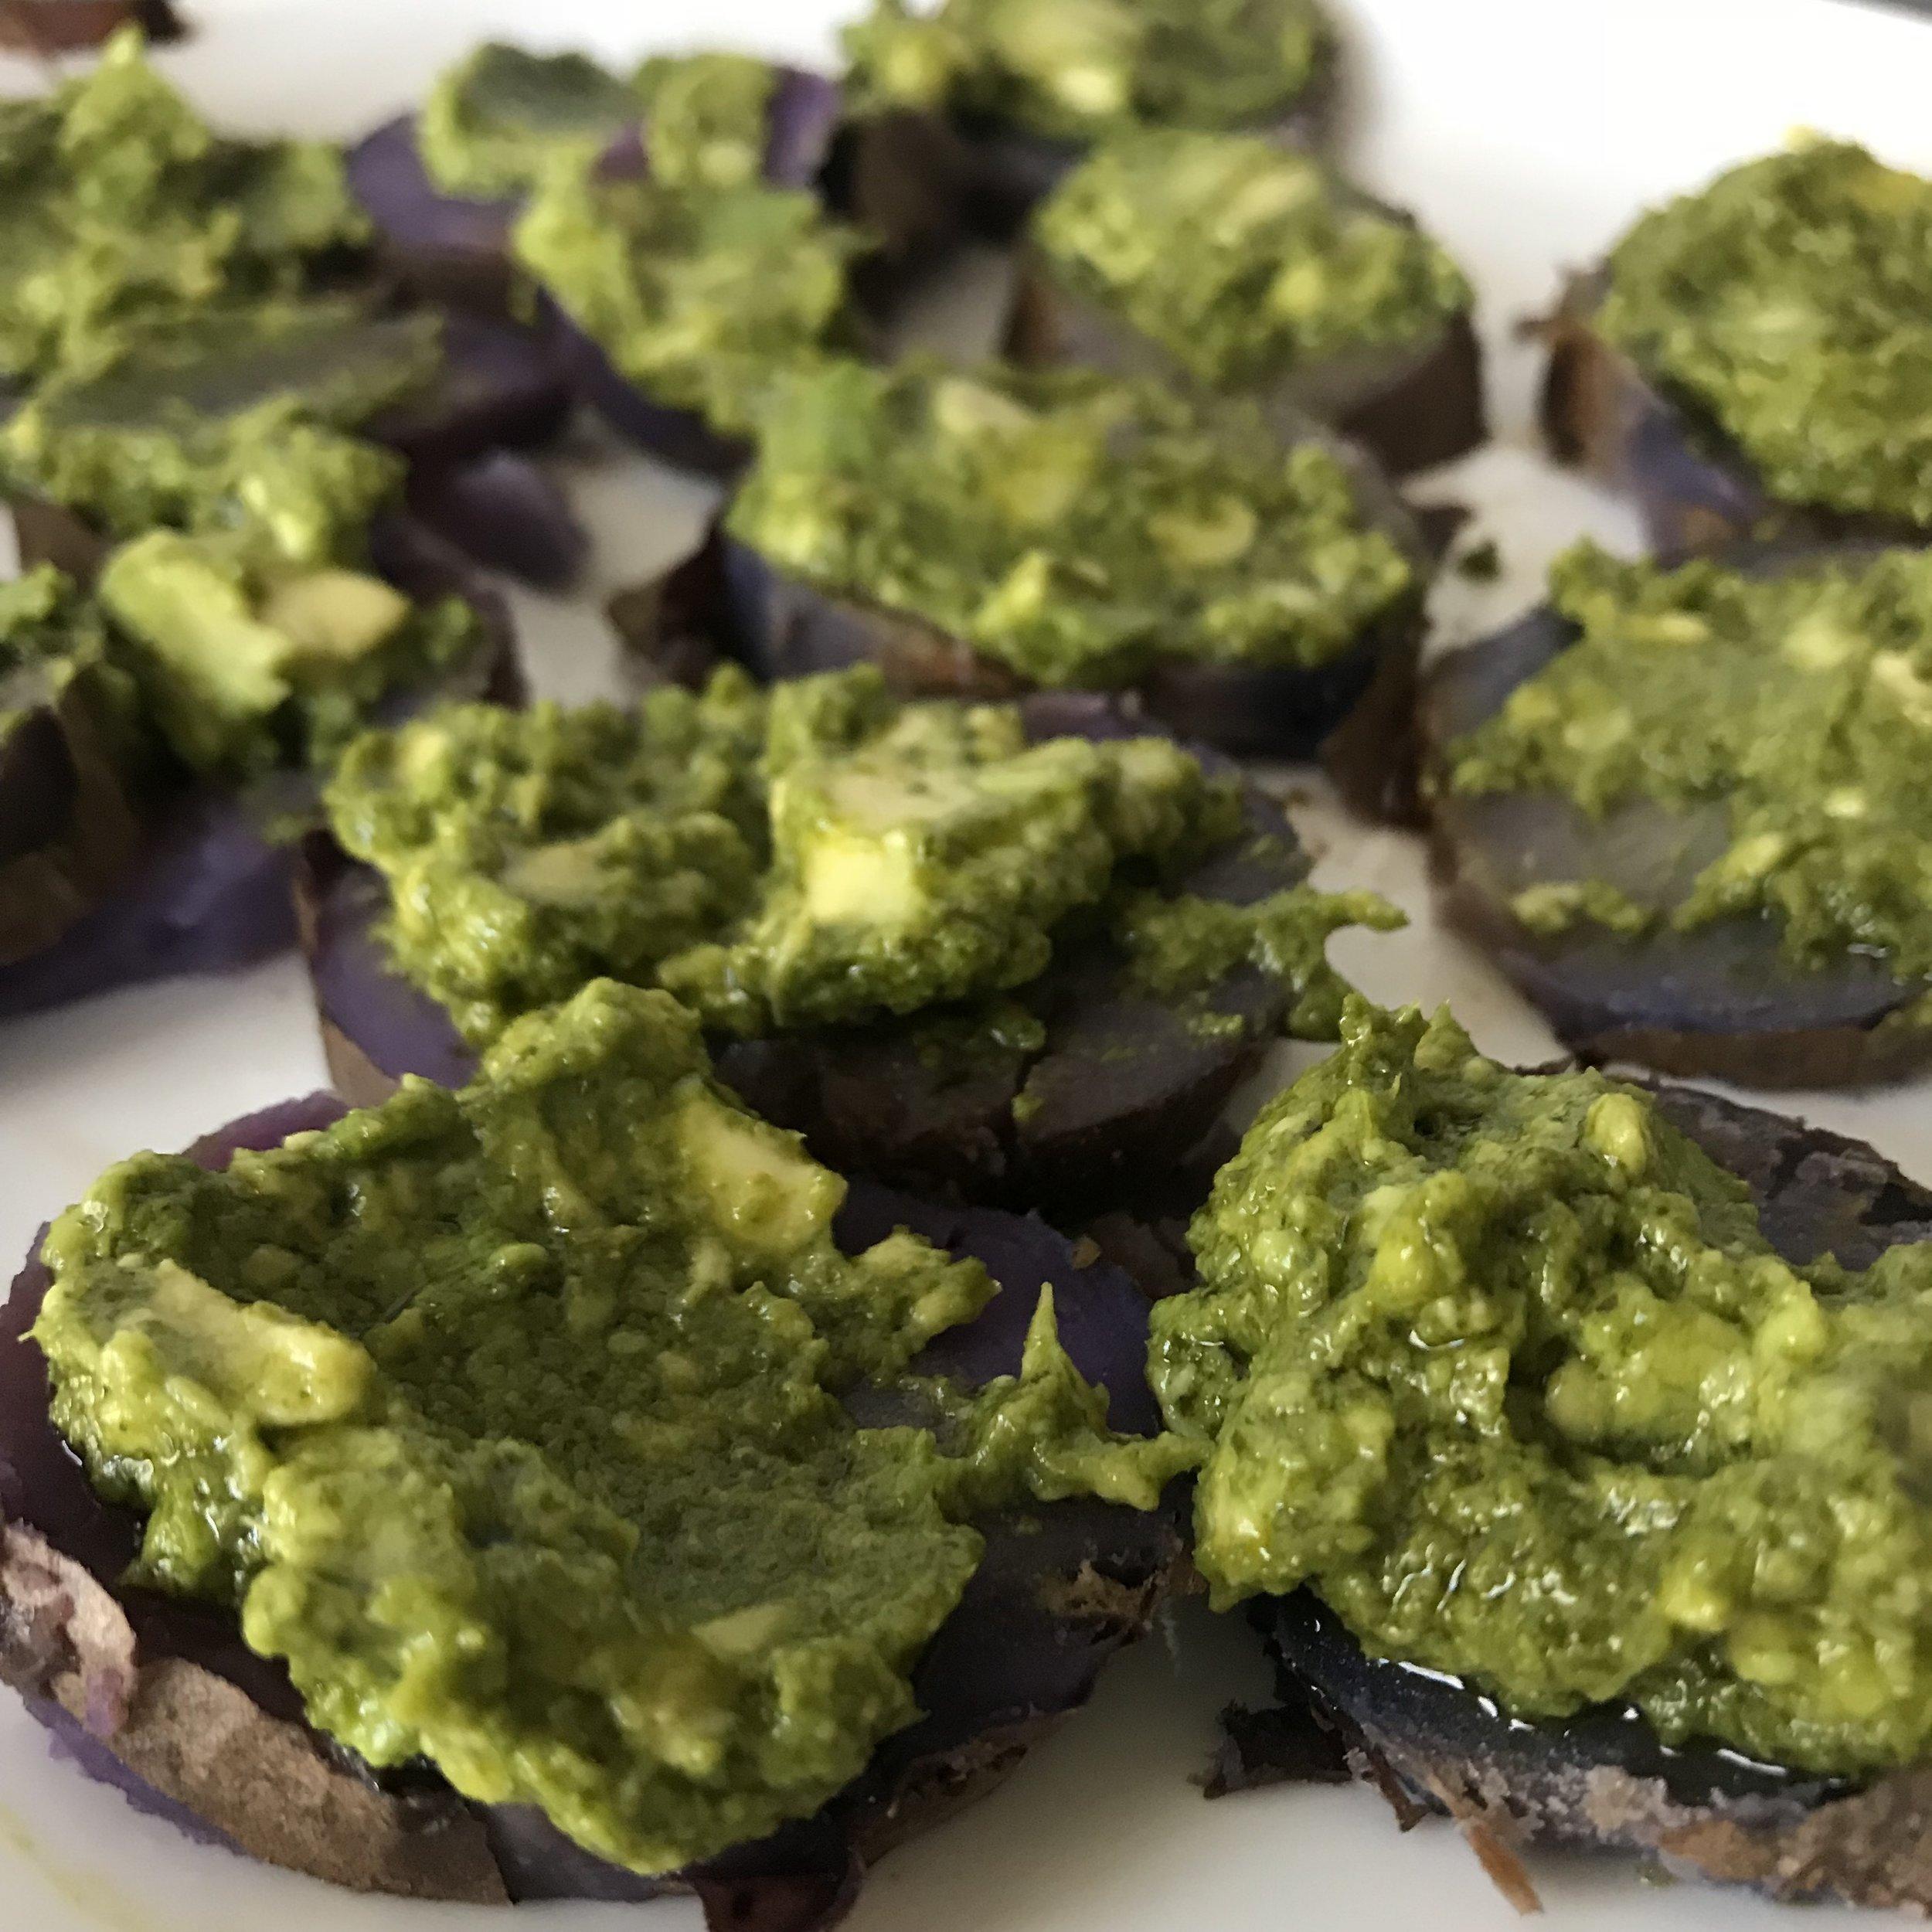 Purple Potatoes with Kale Pesto and Avocado